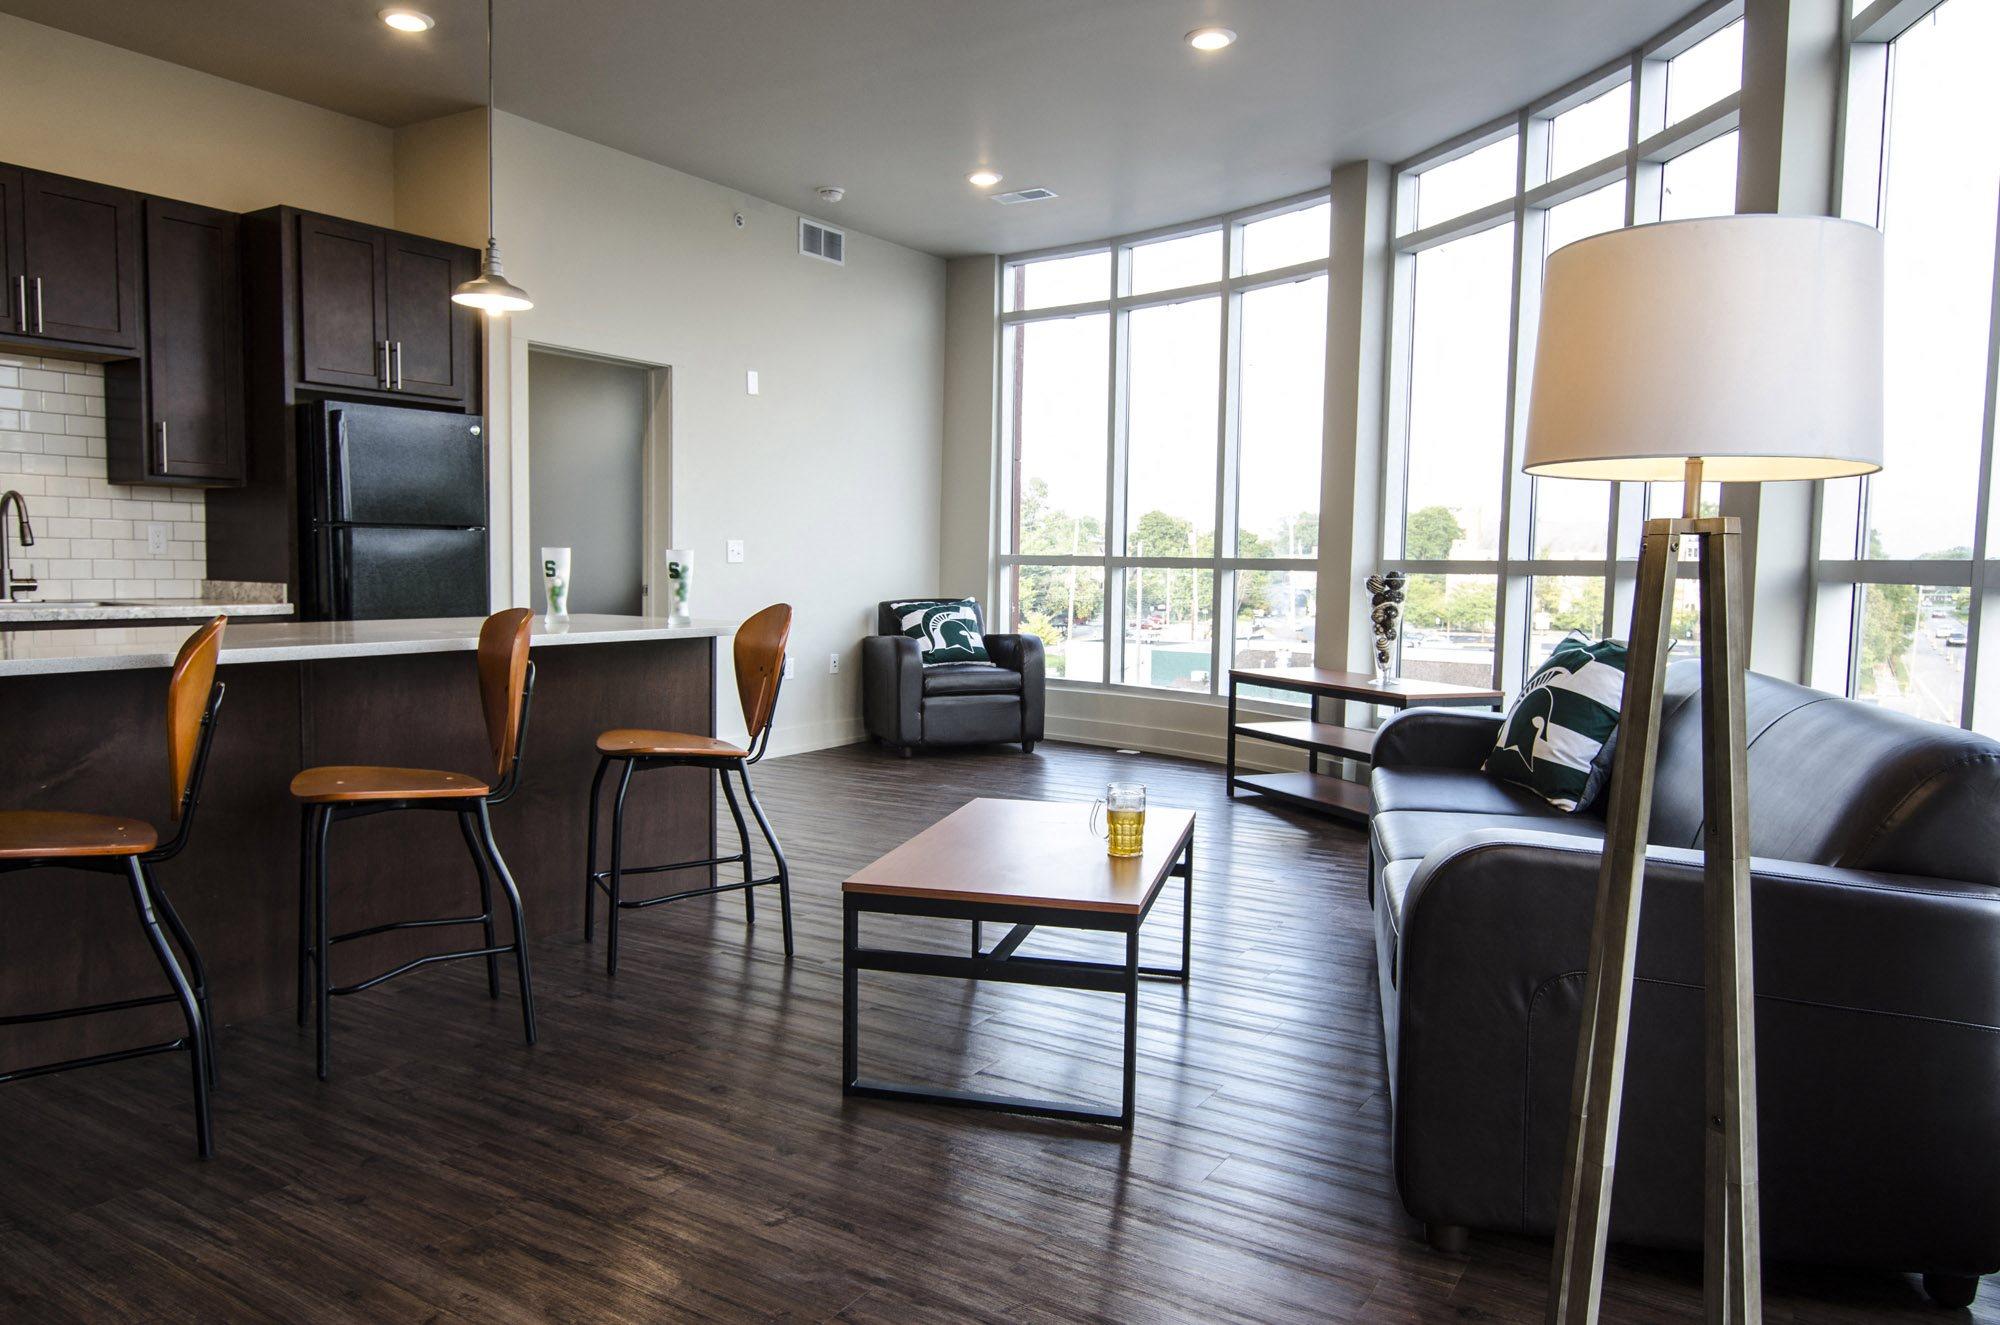 300 Grand  Apartments In East Lansing, Mi-9393